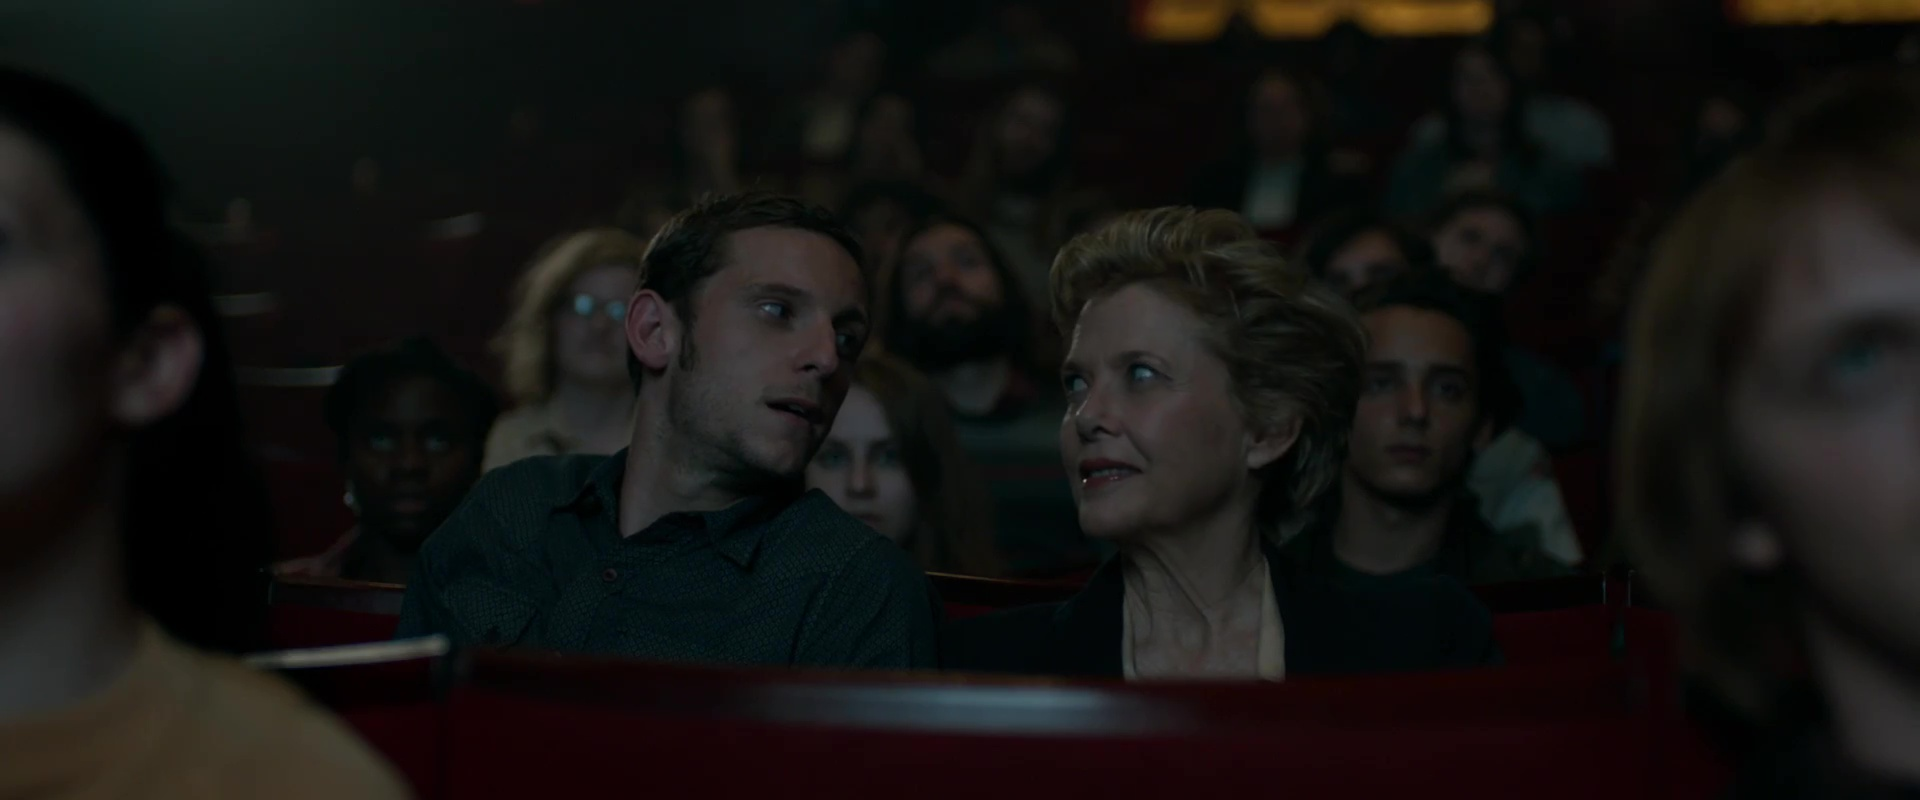 Film Stars Don't Die in Liverpool film still 5